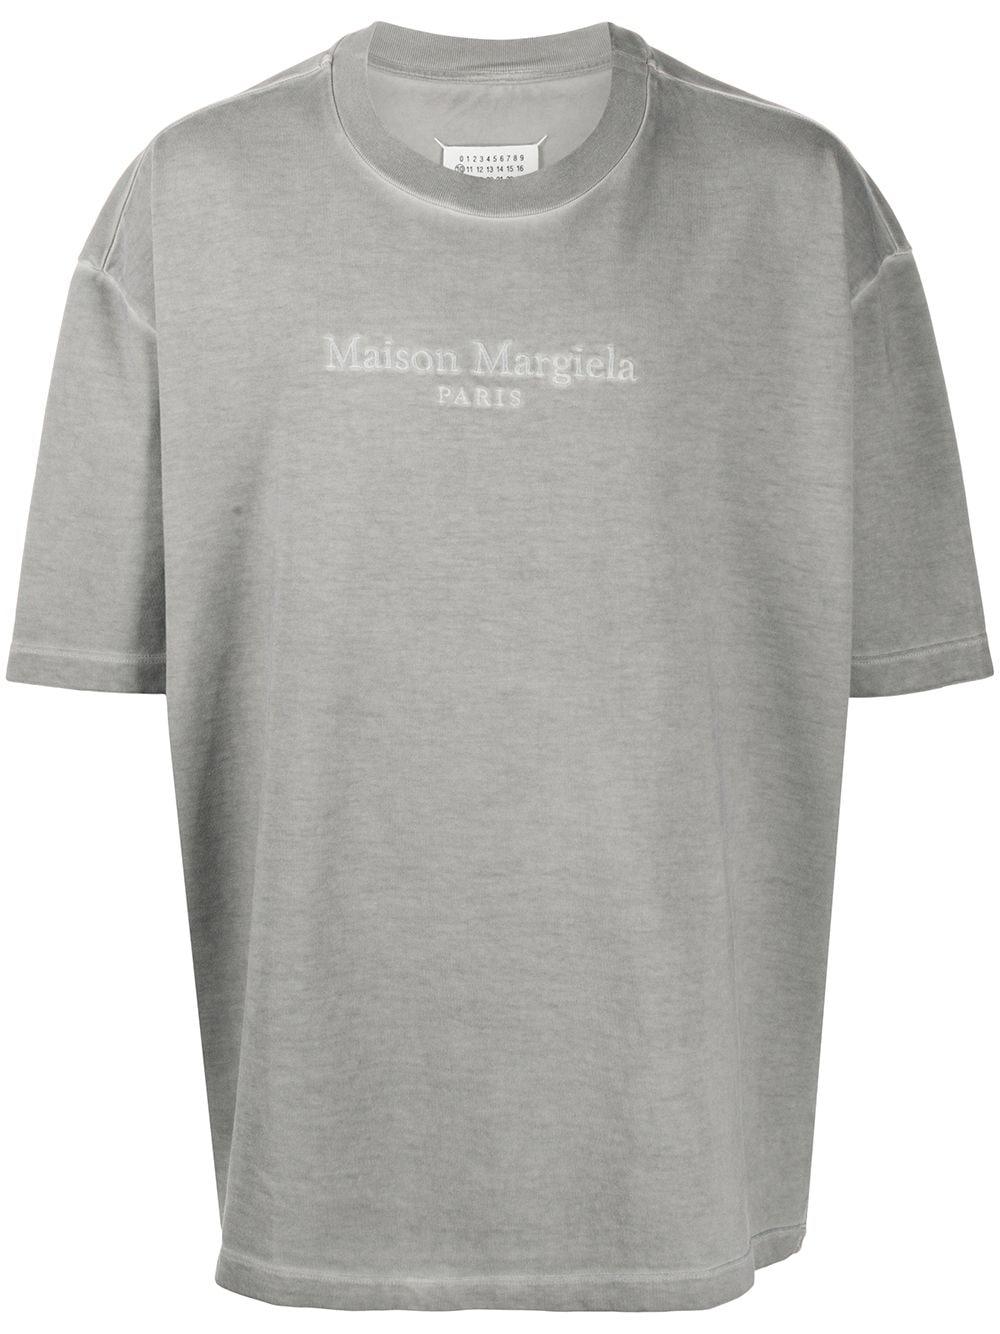 Logo-embroidered Oversized T-shirt